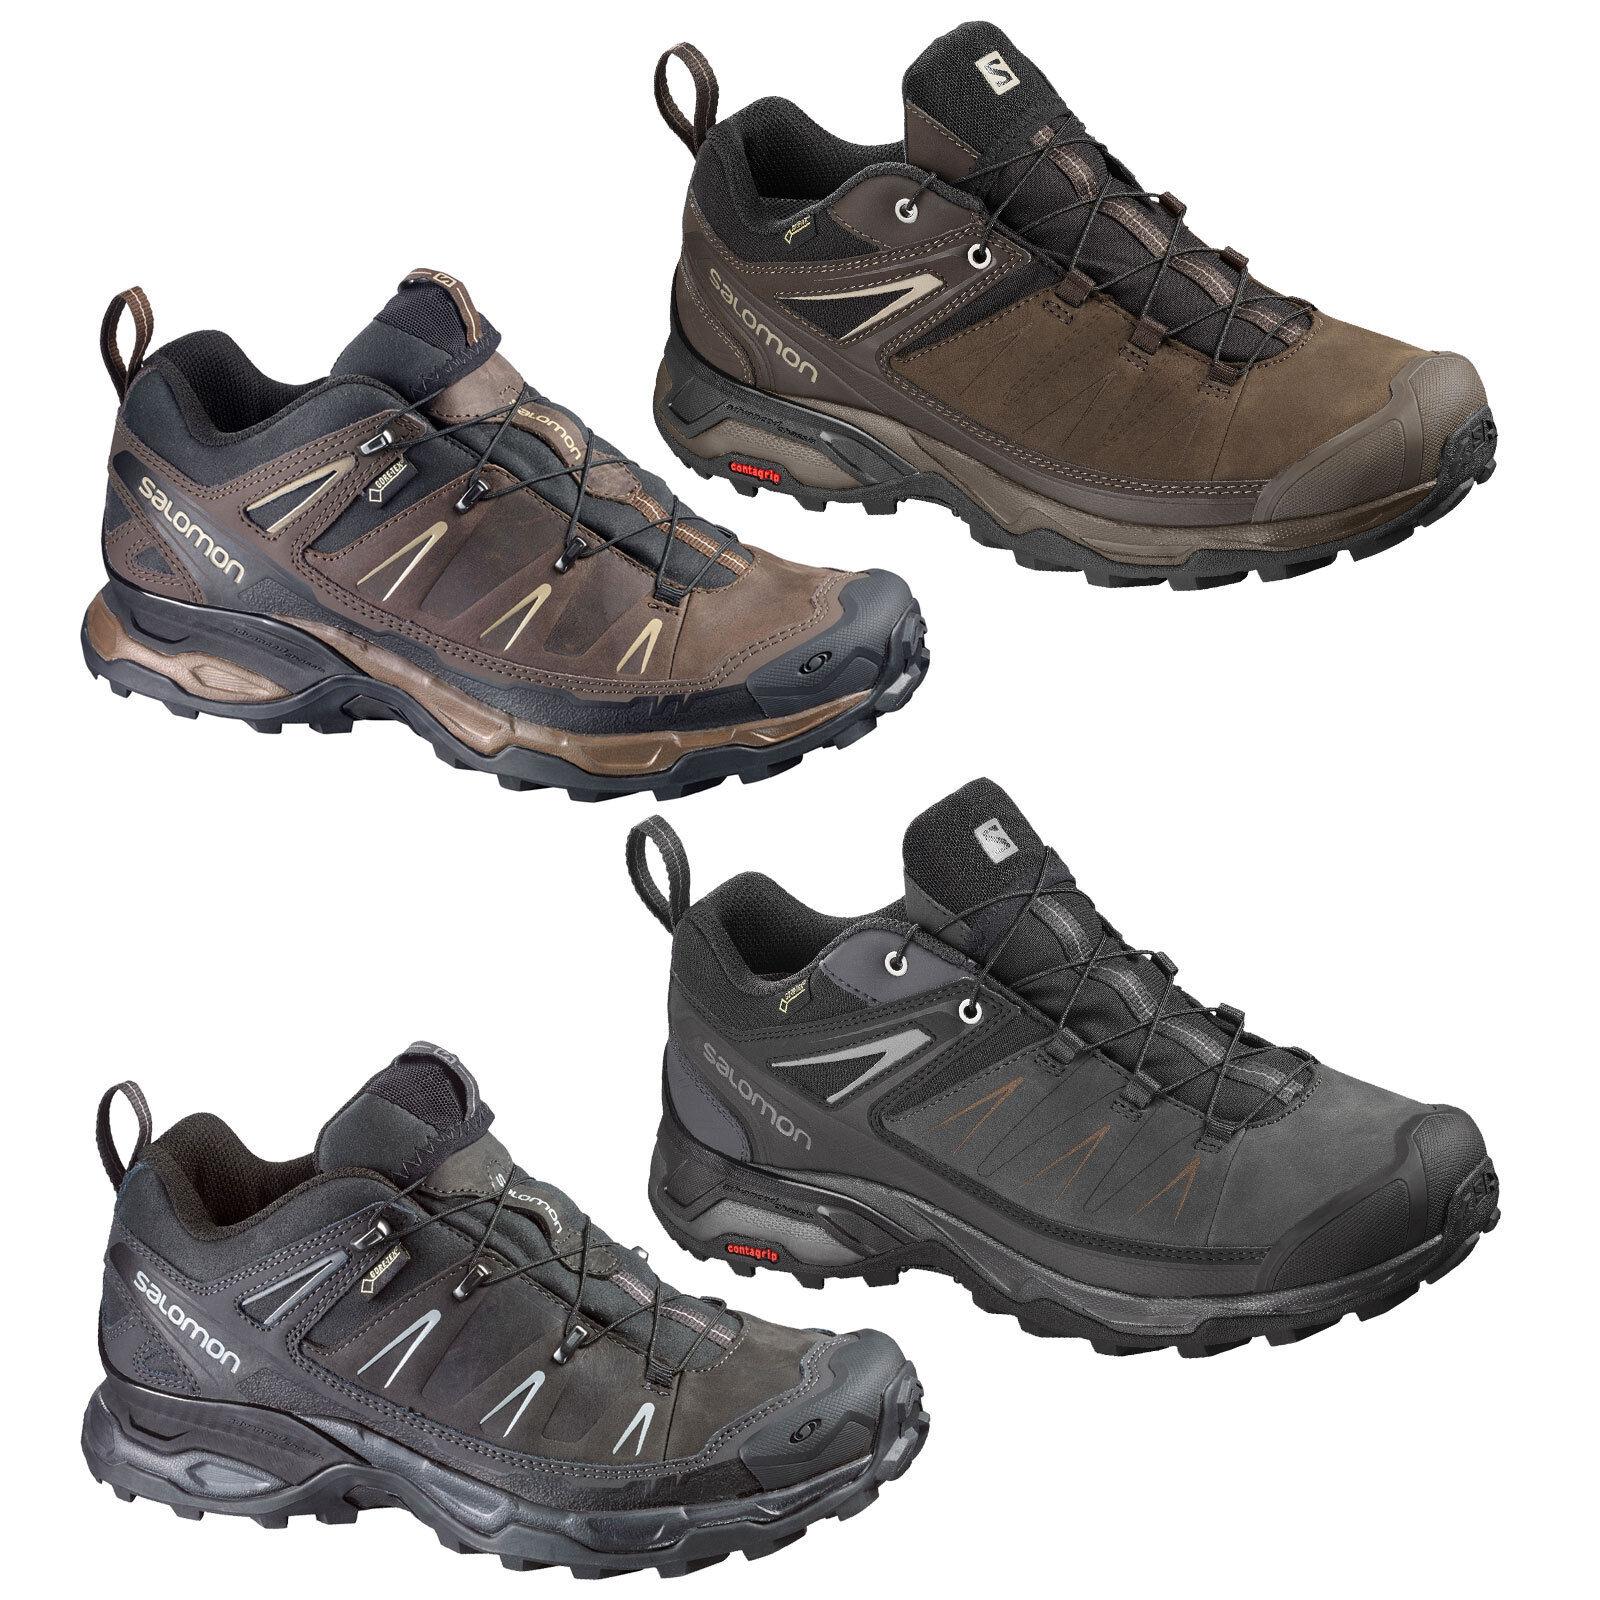 Salomon x Ultra Men's Hiking Boots Gore Tex Outdoor shoes  Leisure Hikking New  best reputation